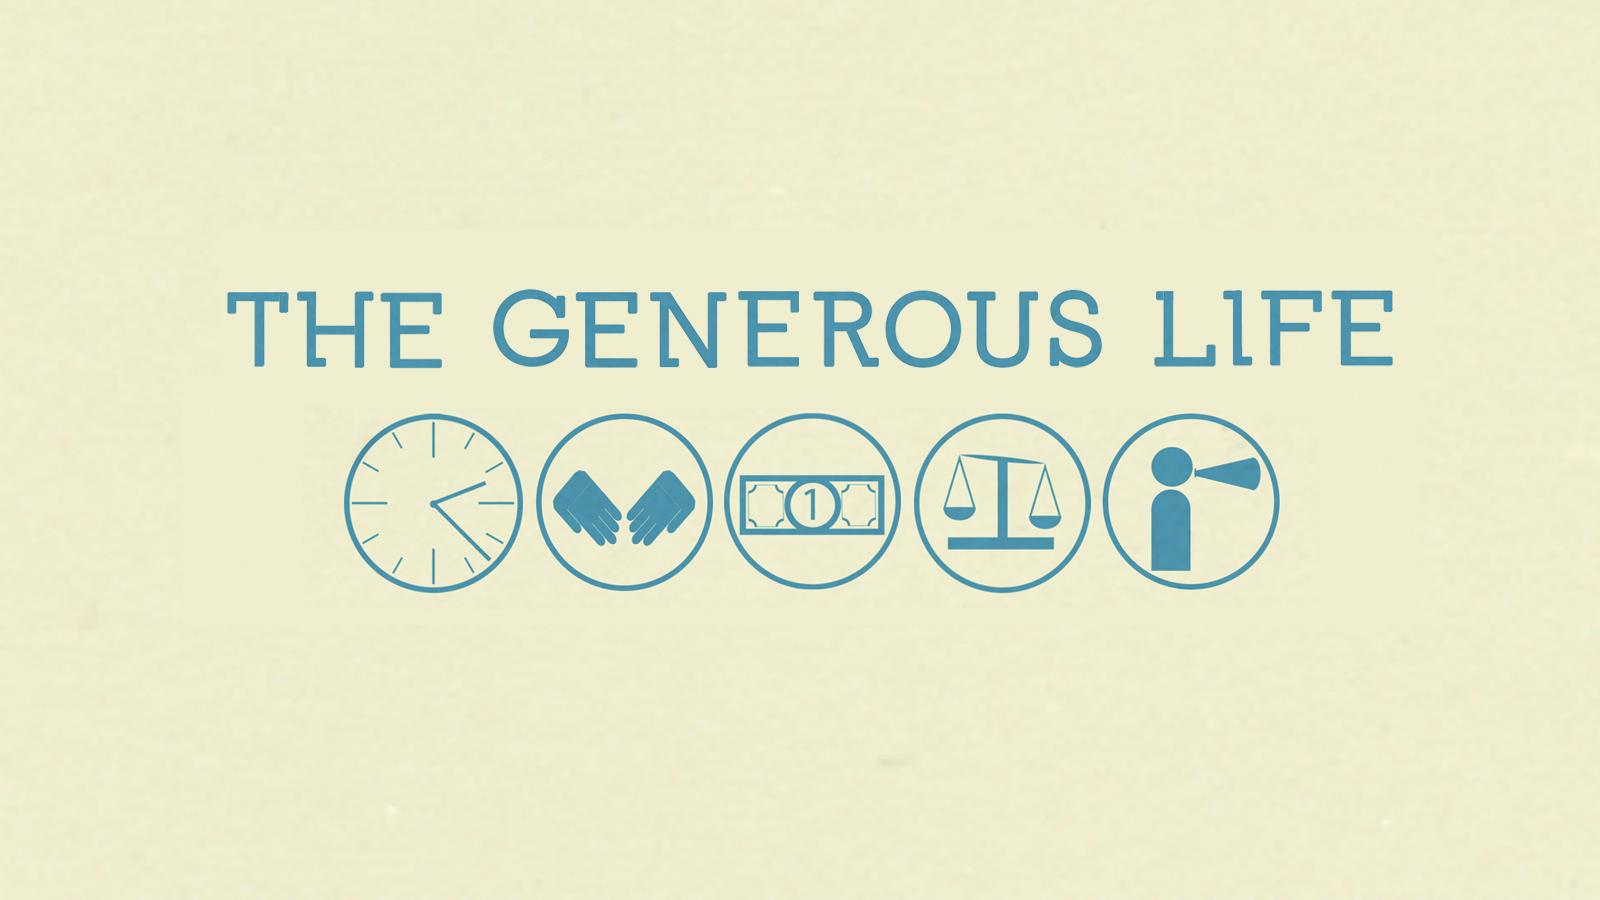 02/08/2015 – The Generous Life Part 4; The Generous Church; Ephesians 4:11-18; David Newman